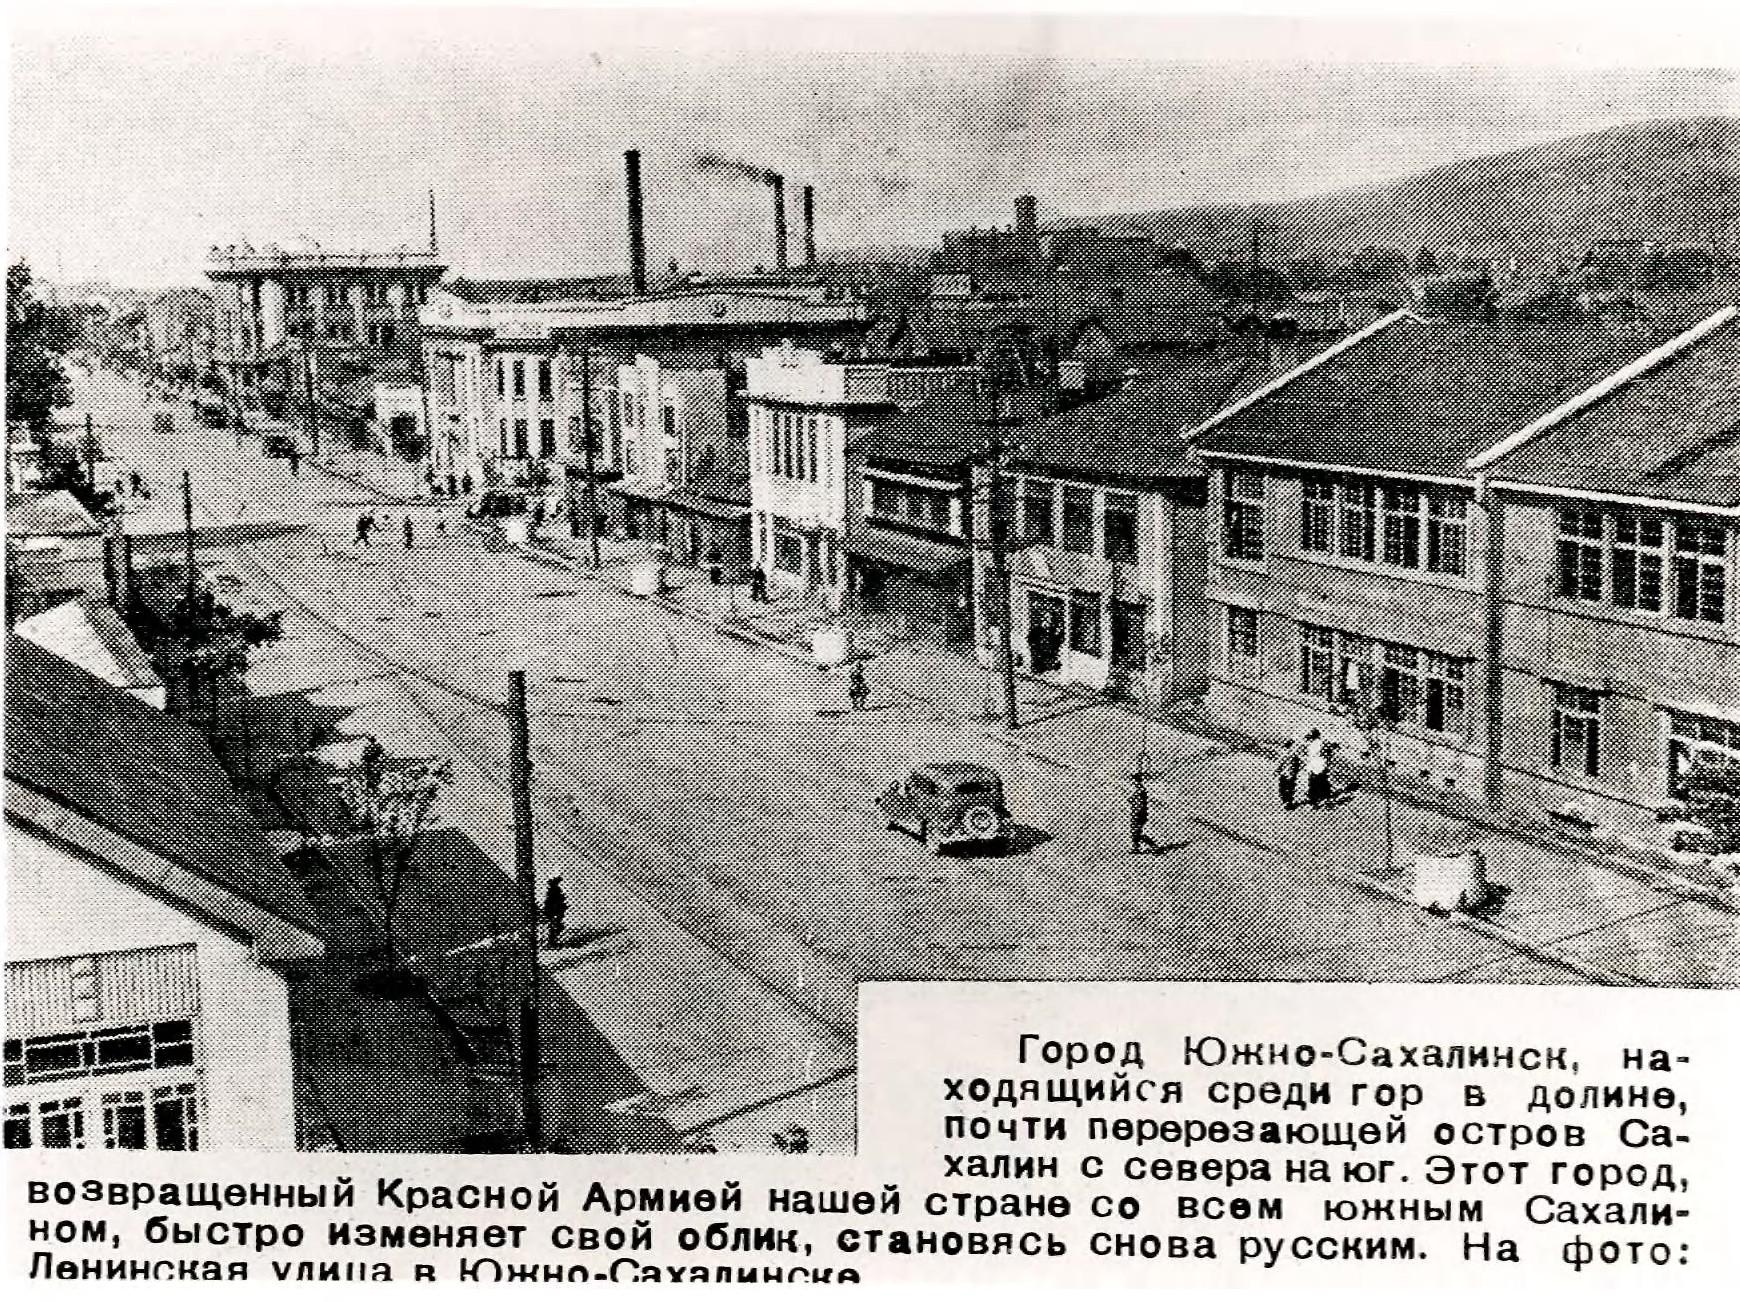 Ленинская улица в Южно-Сахалинске